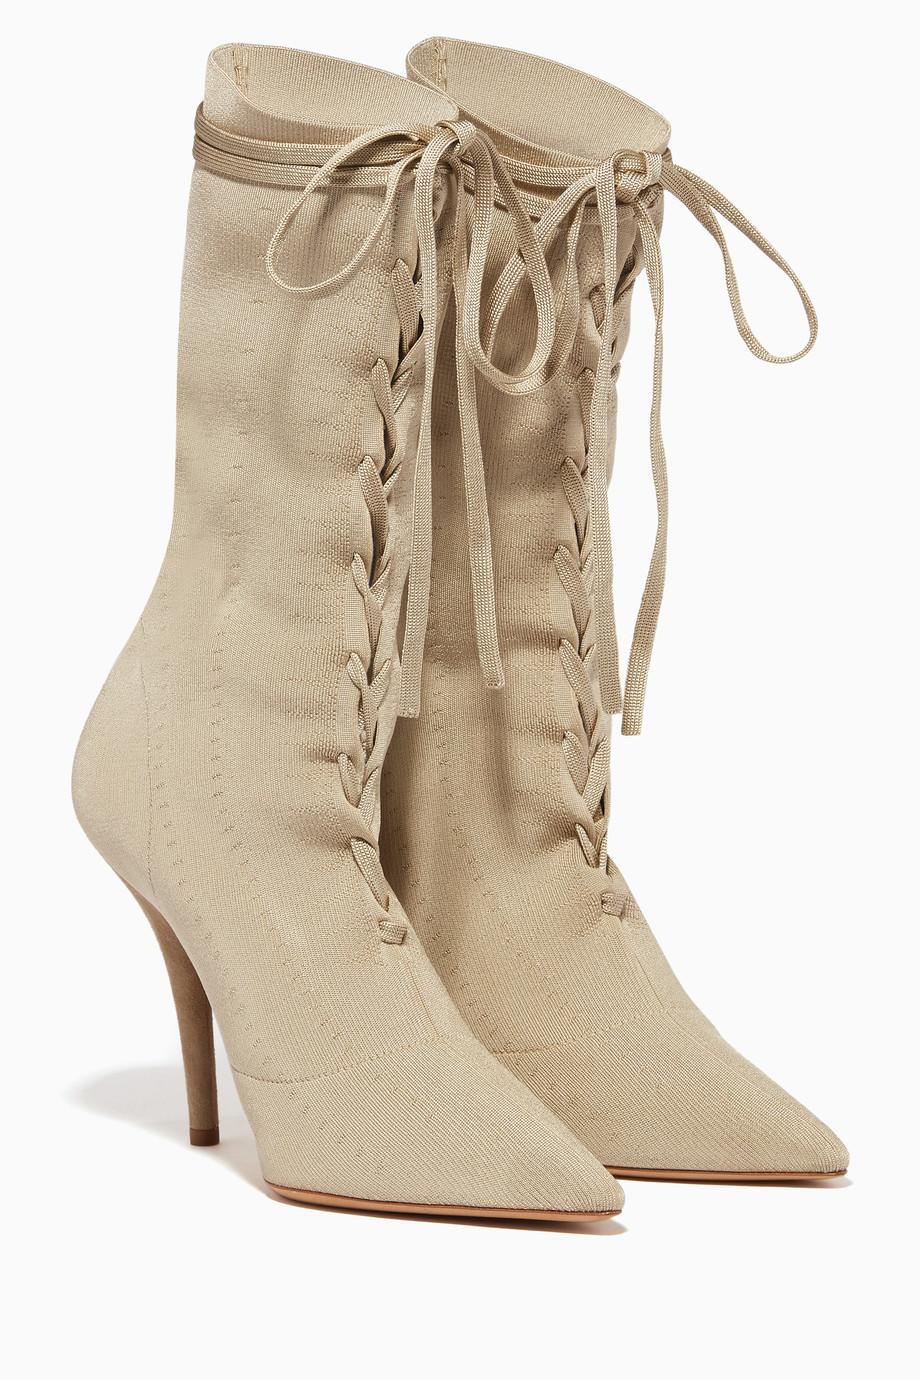 3cbdfcbede8 Shop Yeezy Brown Beige Lace-Up Sock Boots for Women